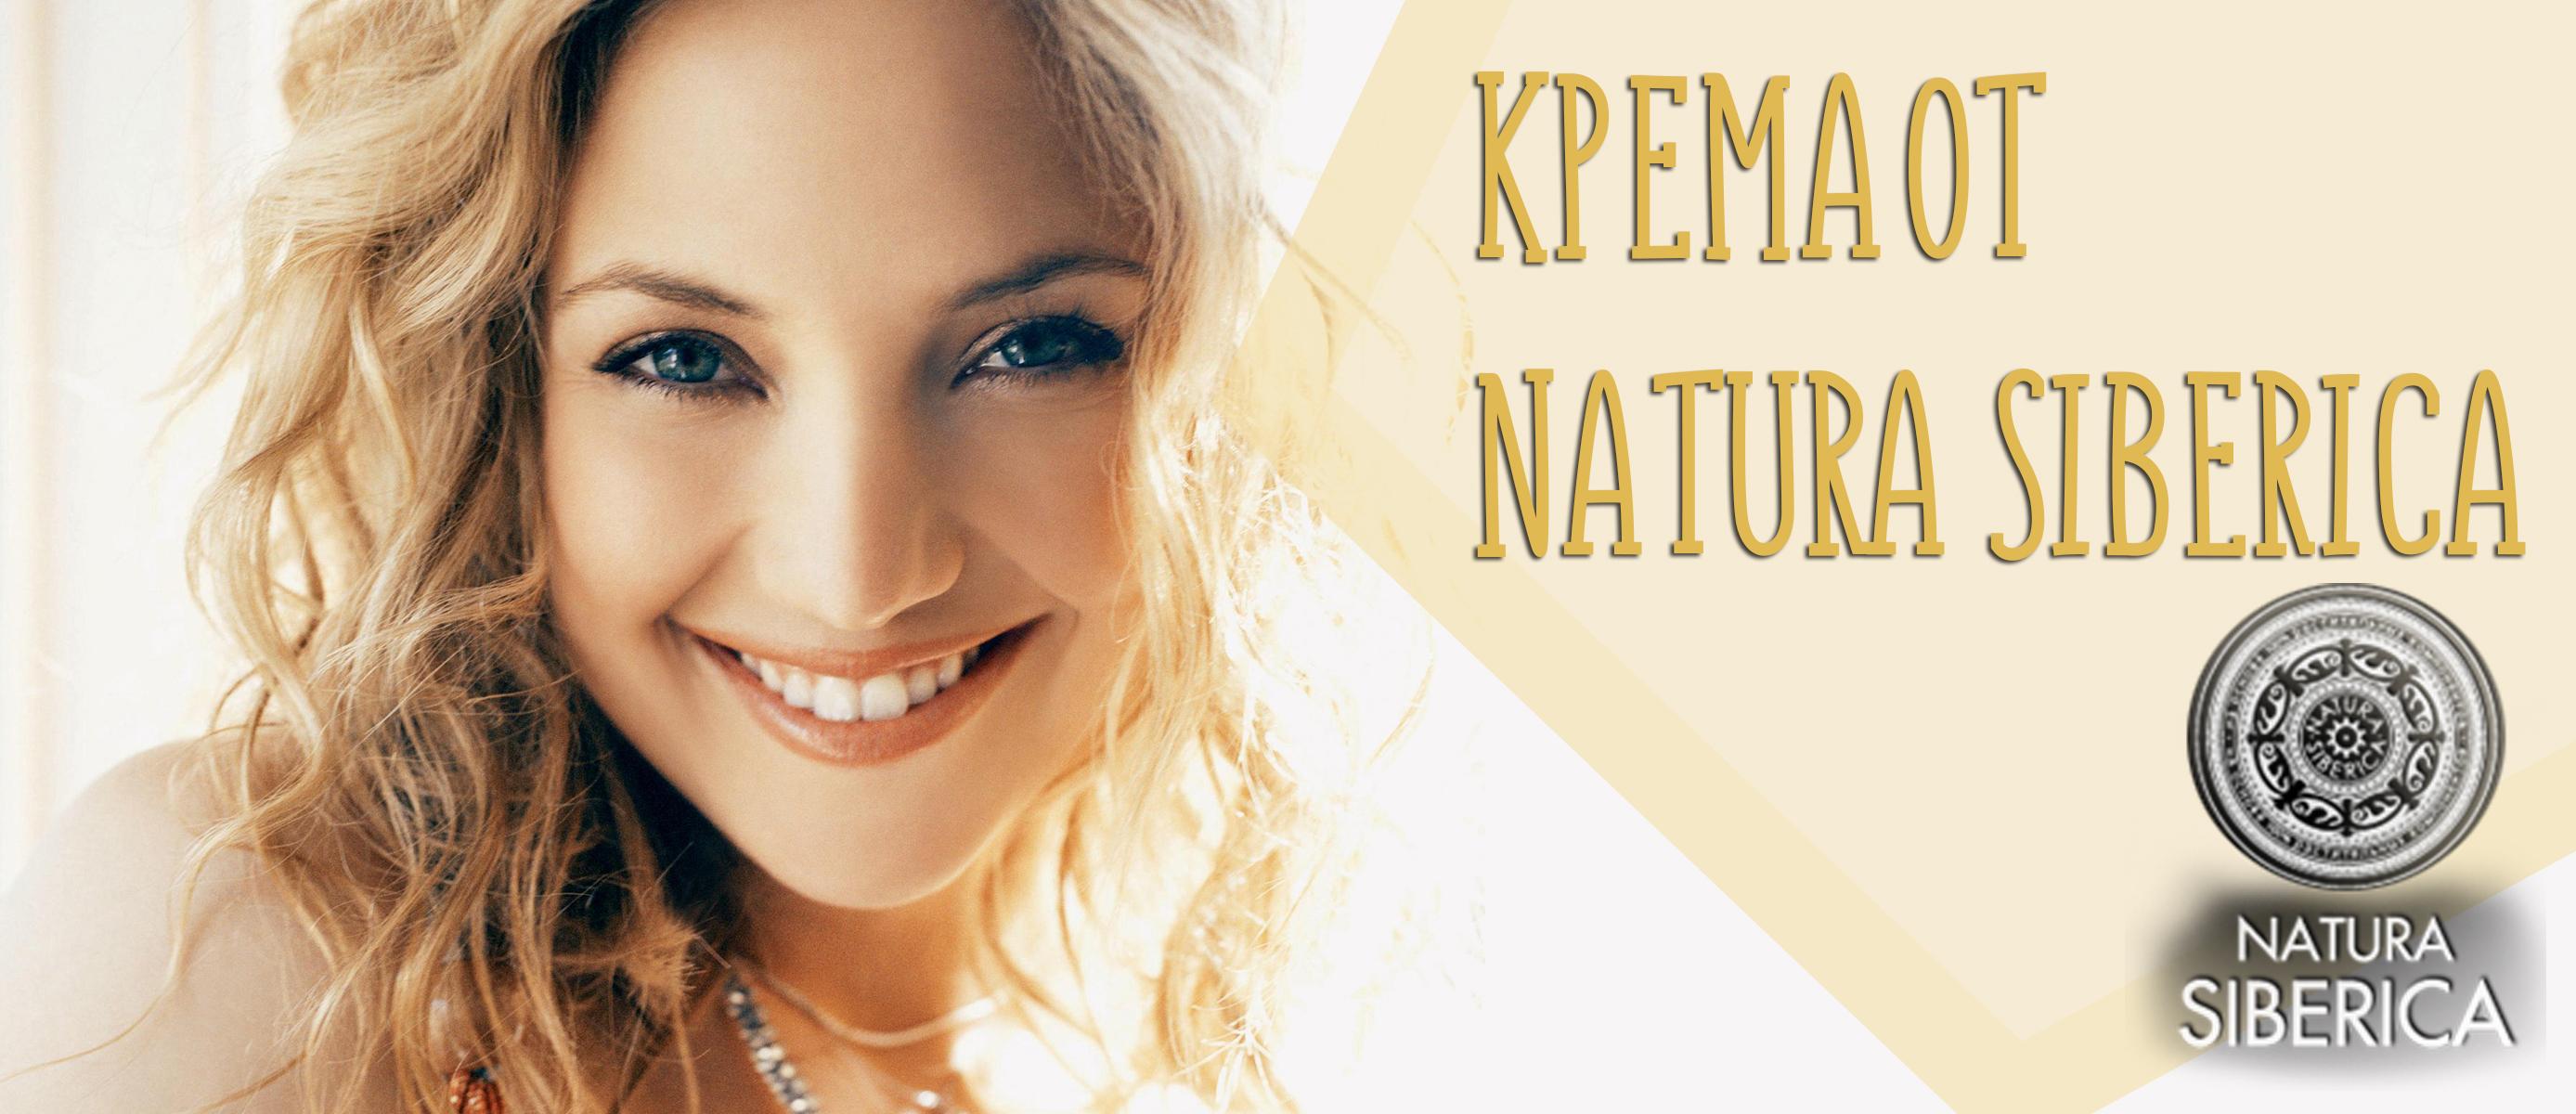 Отзывы на крема для лица от Натура Сиберика